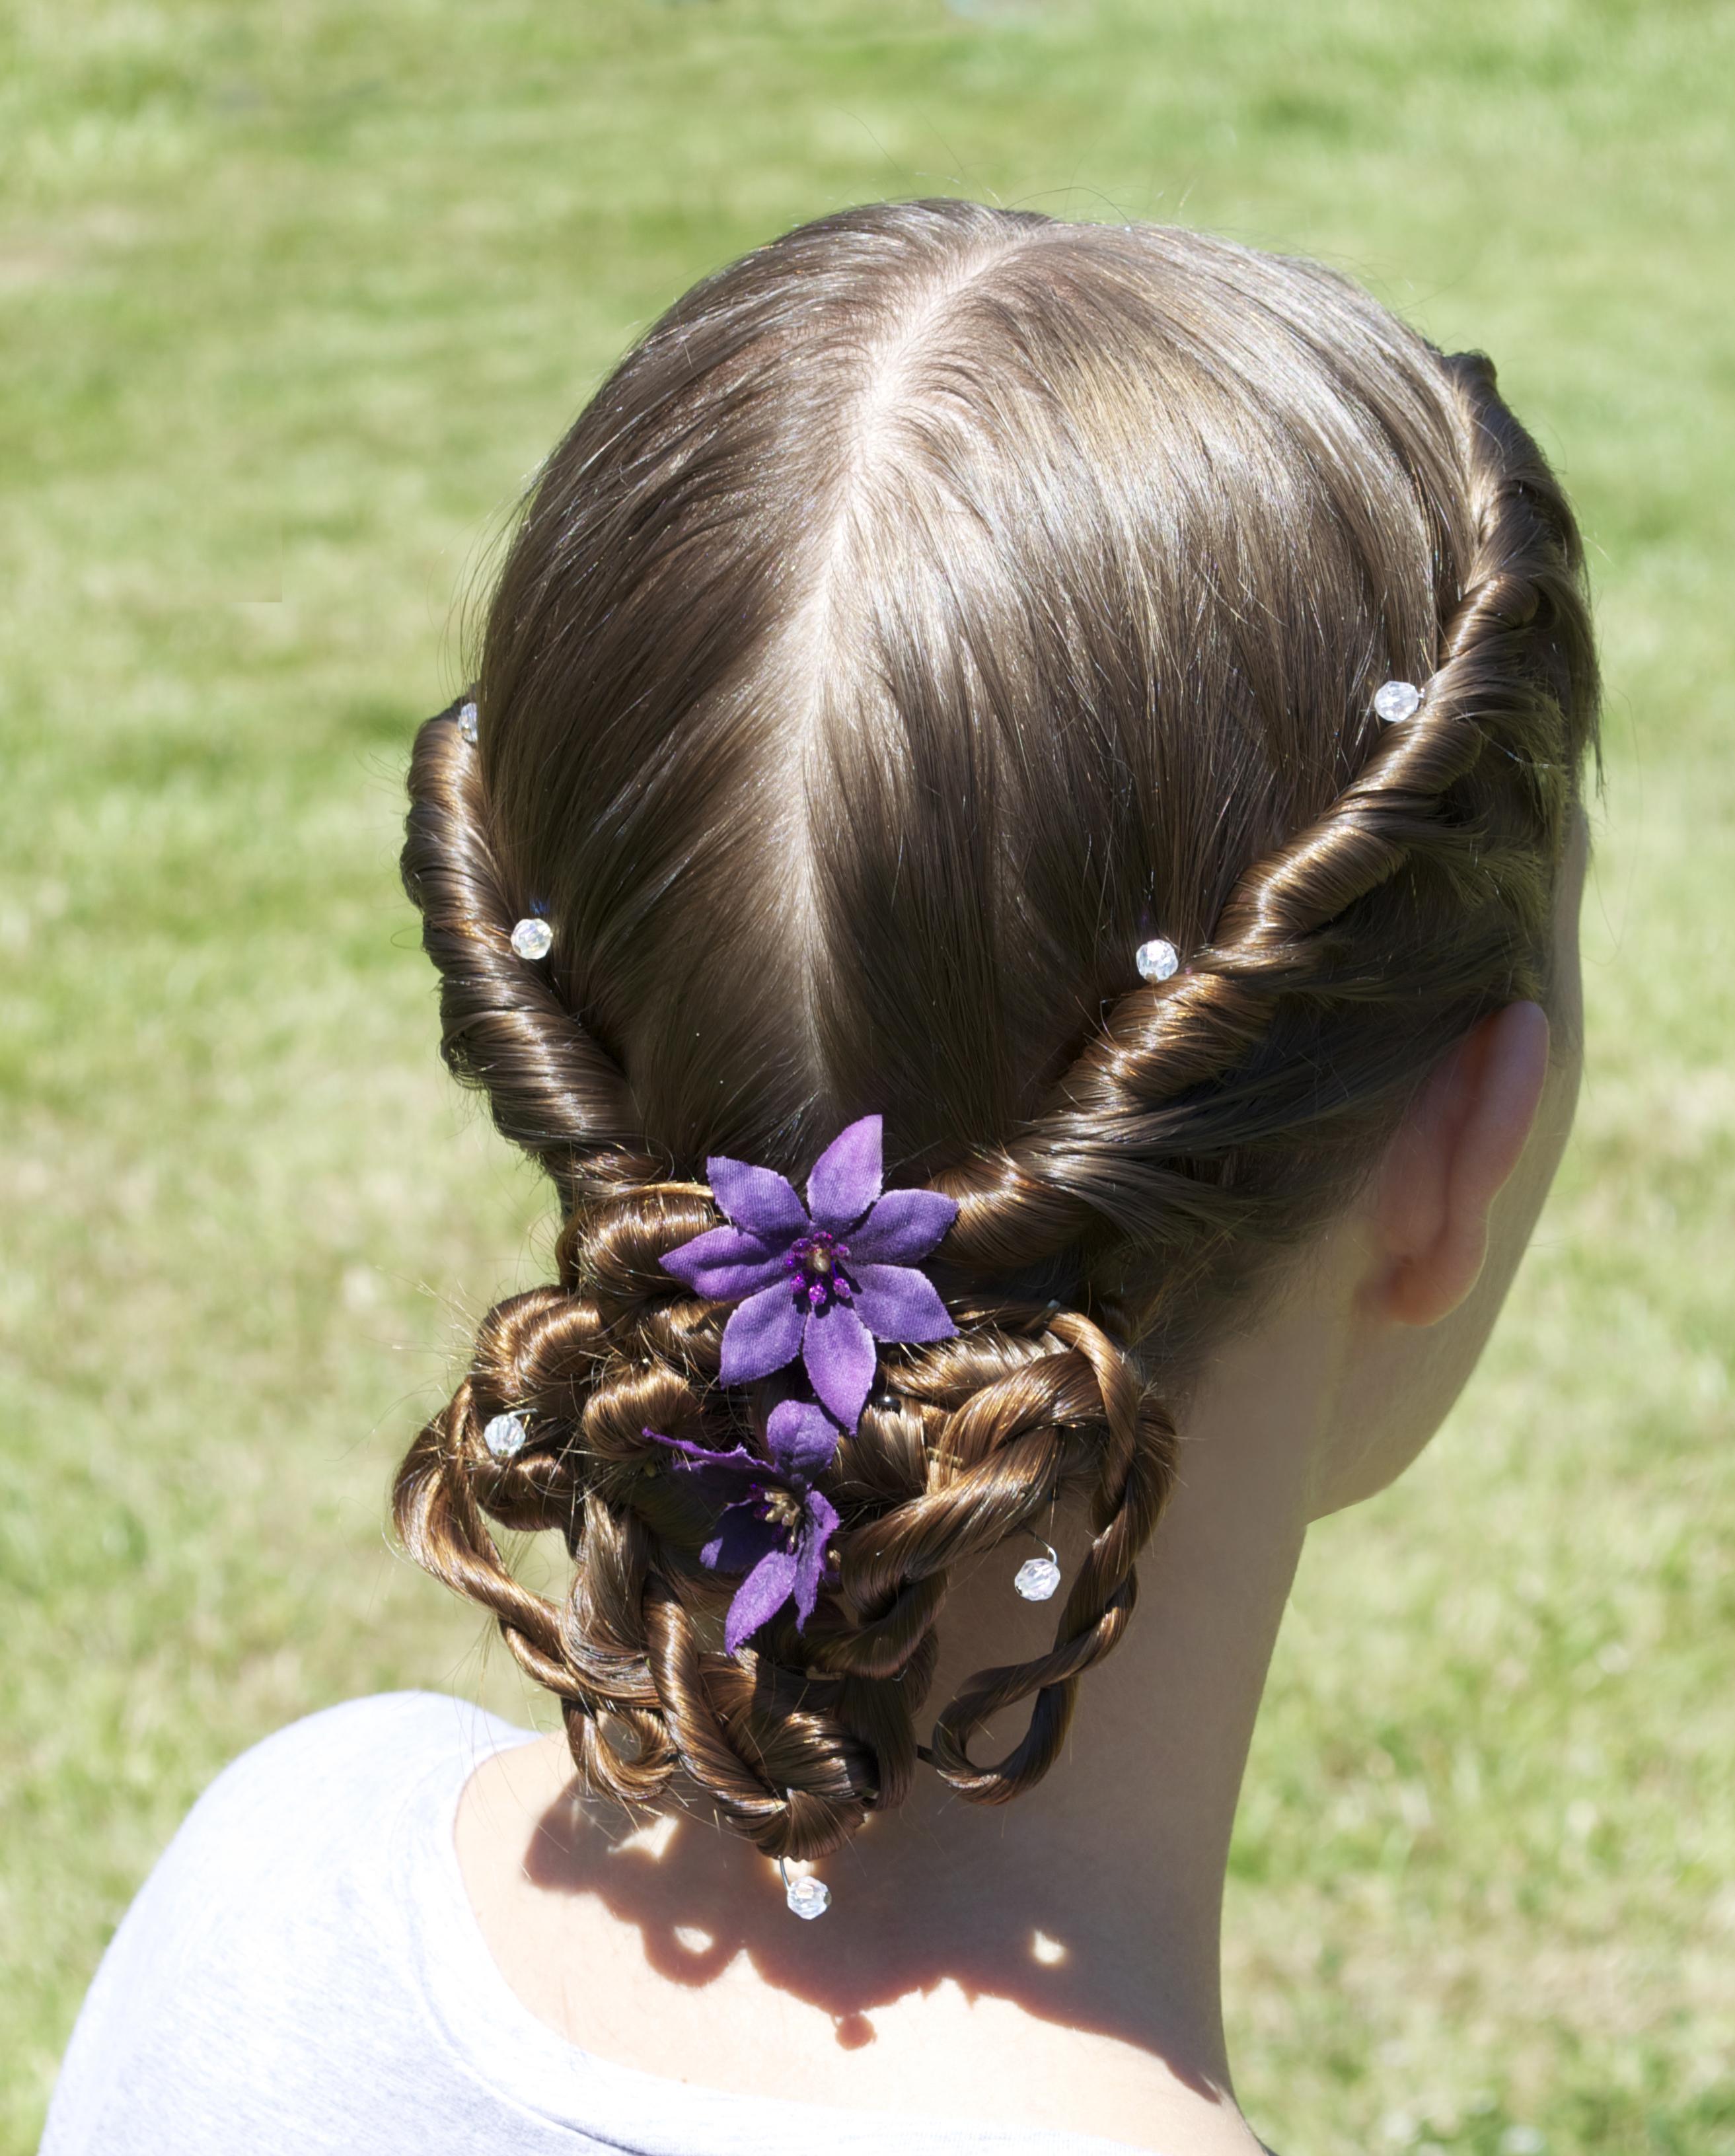 1-strand, twist, lace, double, mini one twist